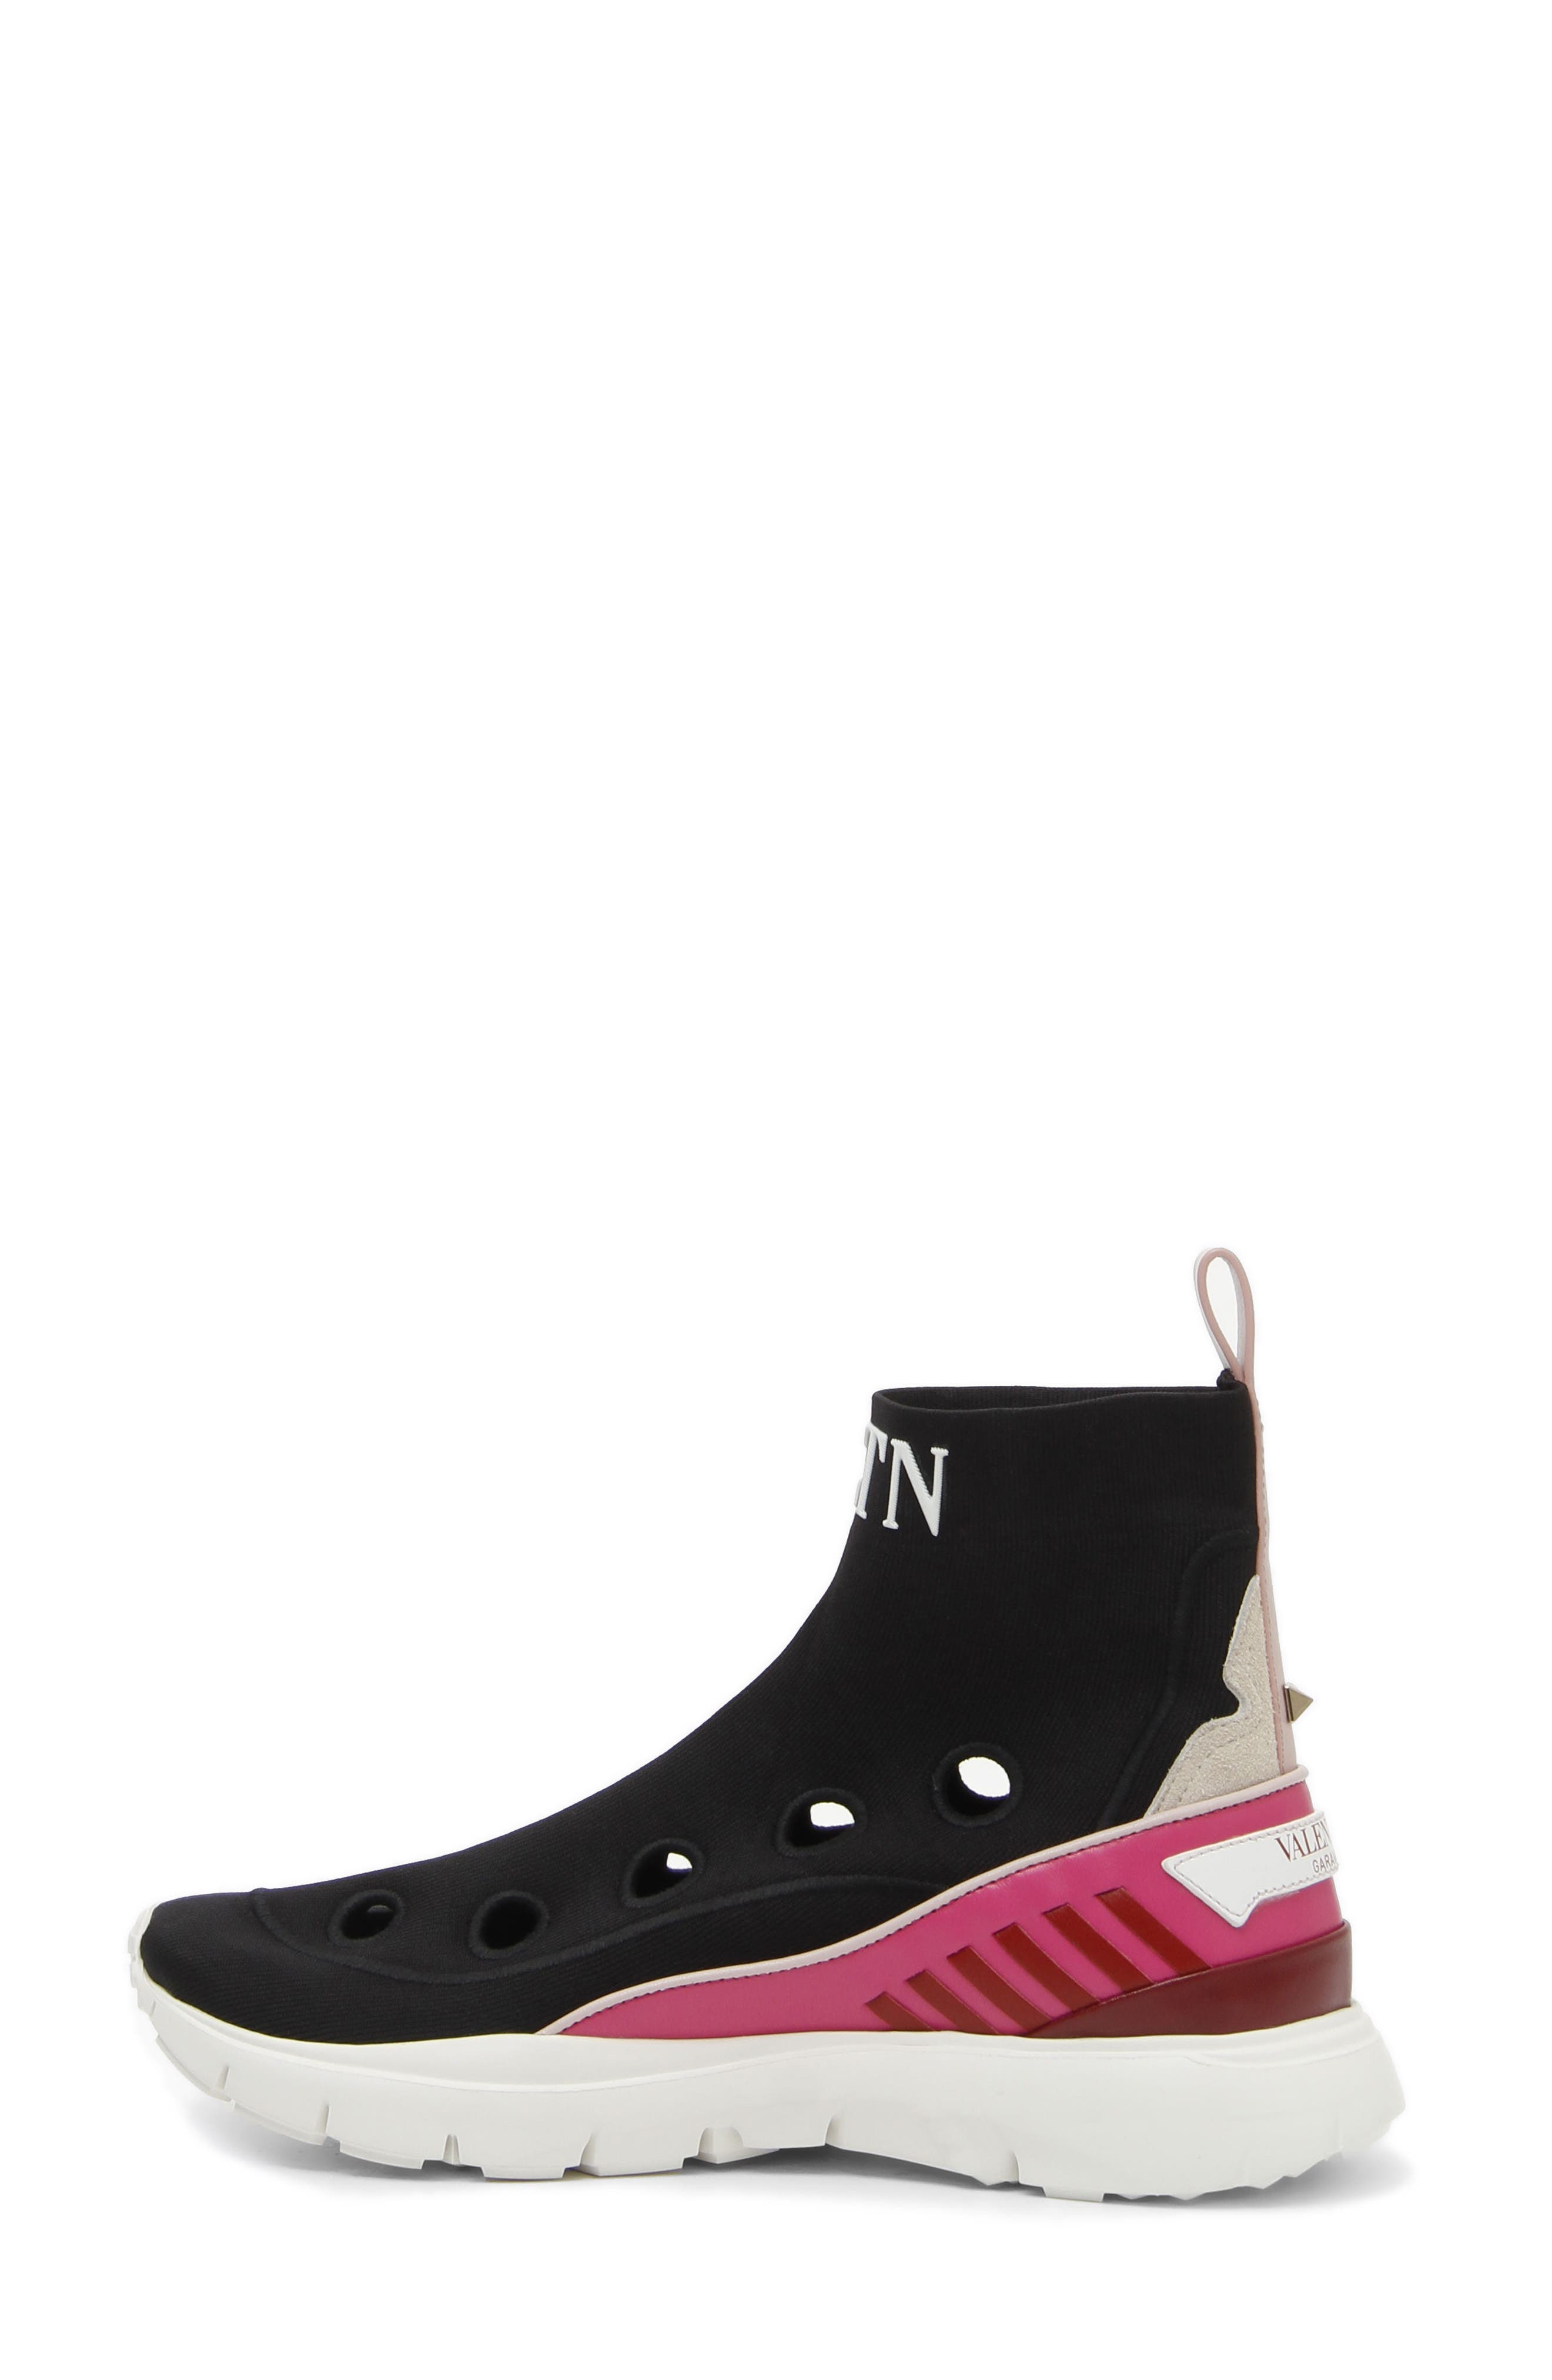 VALENTINO GARAVANI Heroes High Top Sneaker (Women)